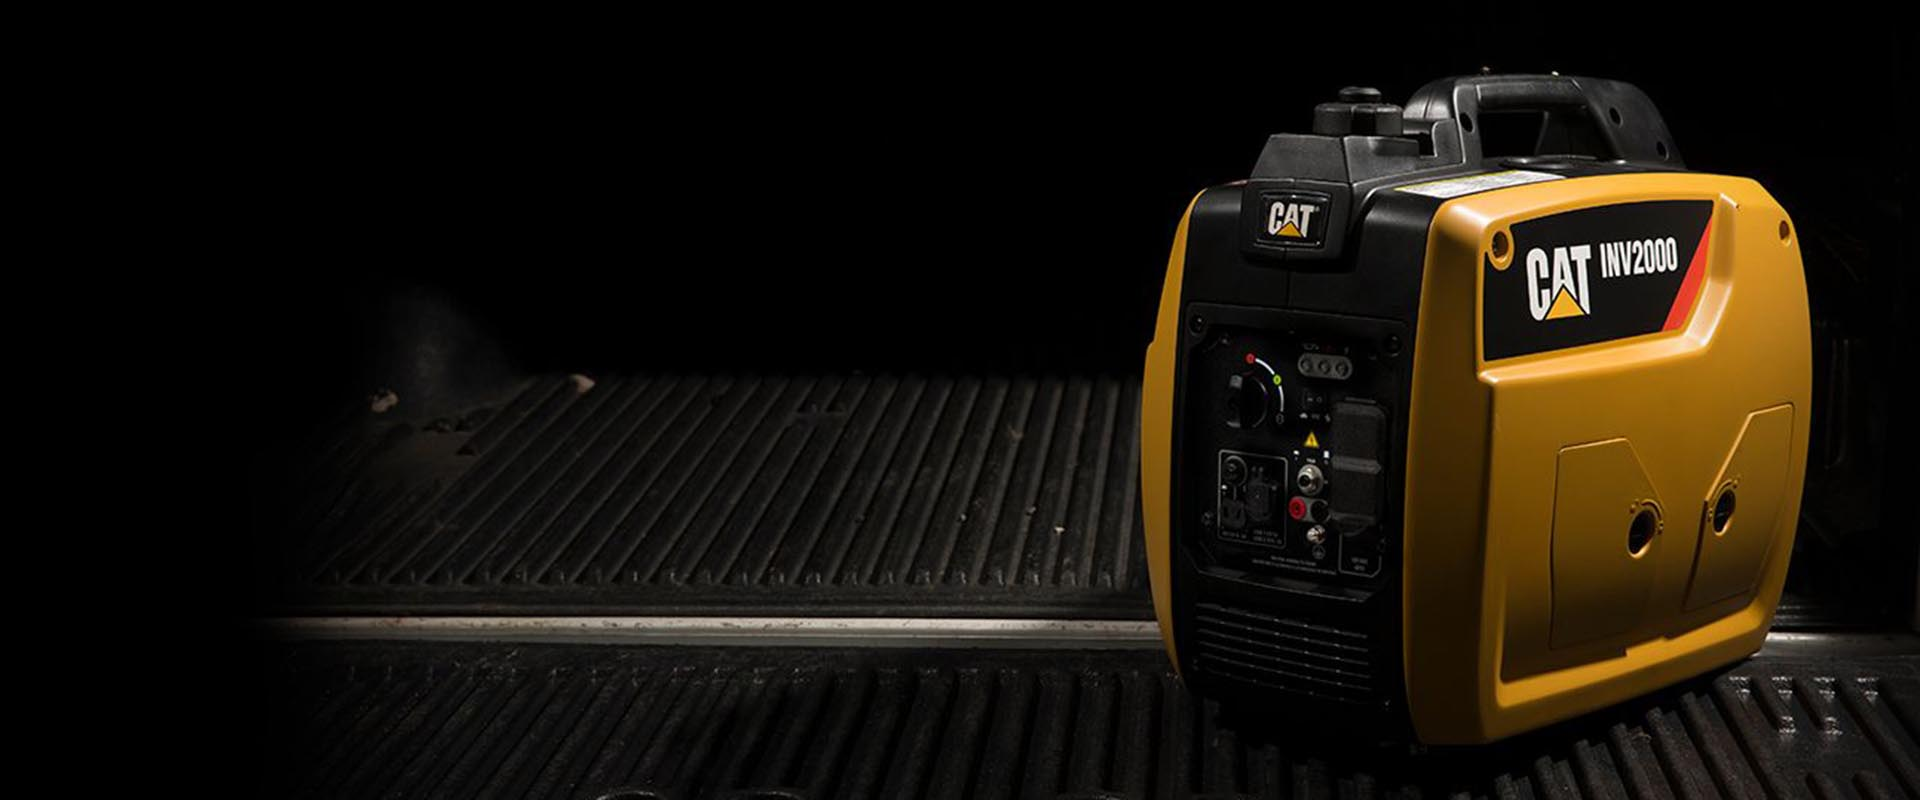 cat-portable-generators-banner